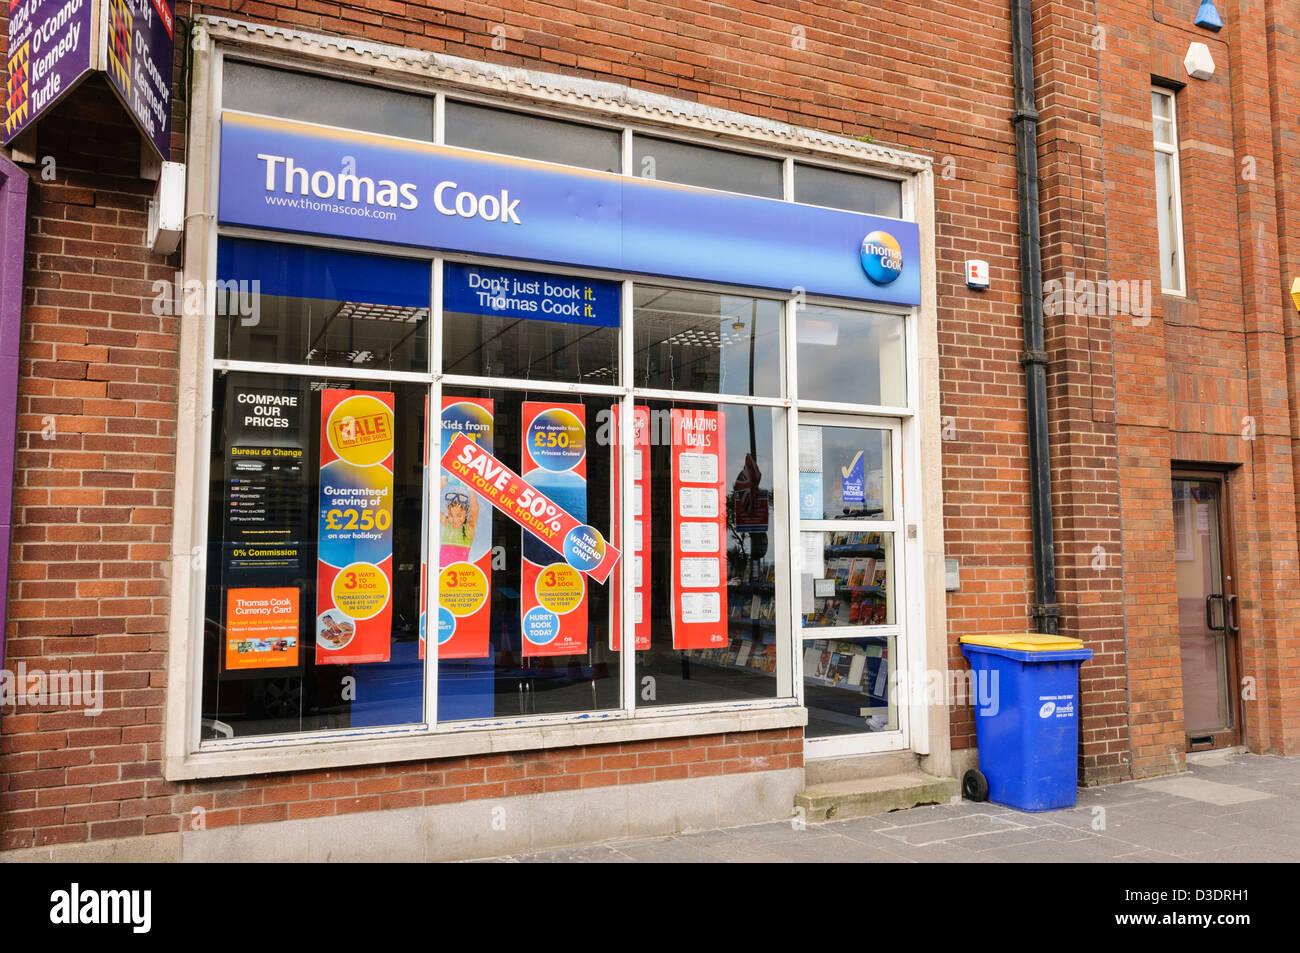 Thomas Cook travel agent, Carrickfergus - Stock Image